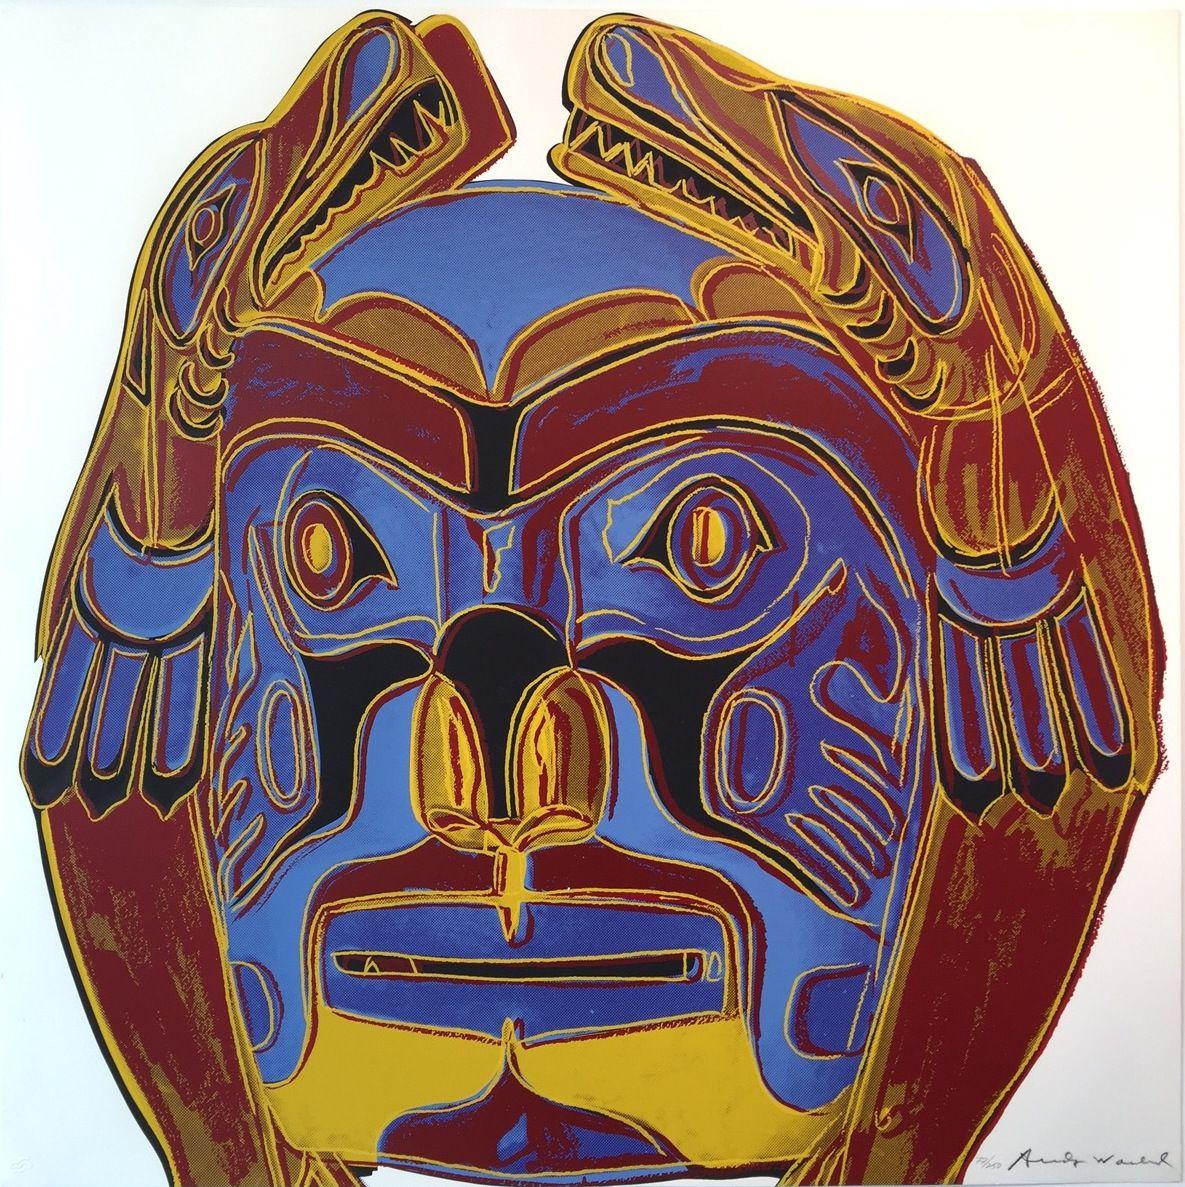 Andy Warhol Gregg Shienbaum Fine Art Warhol art, Andy